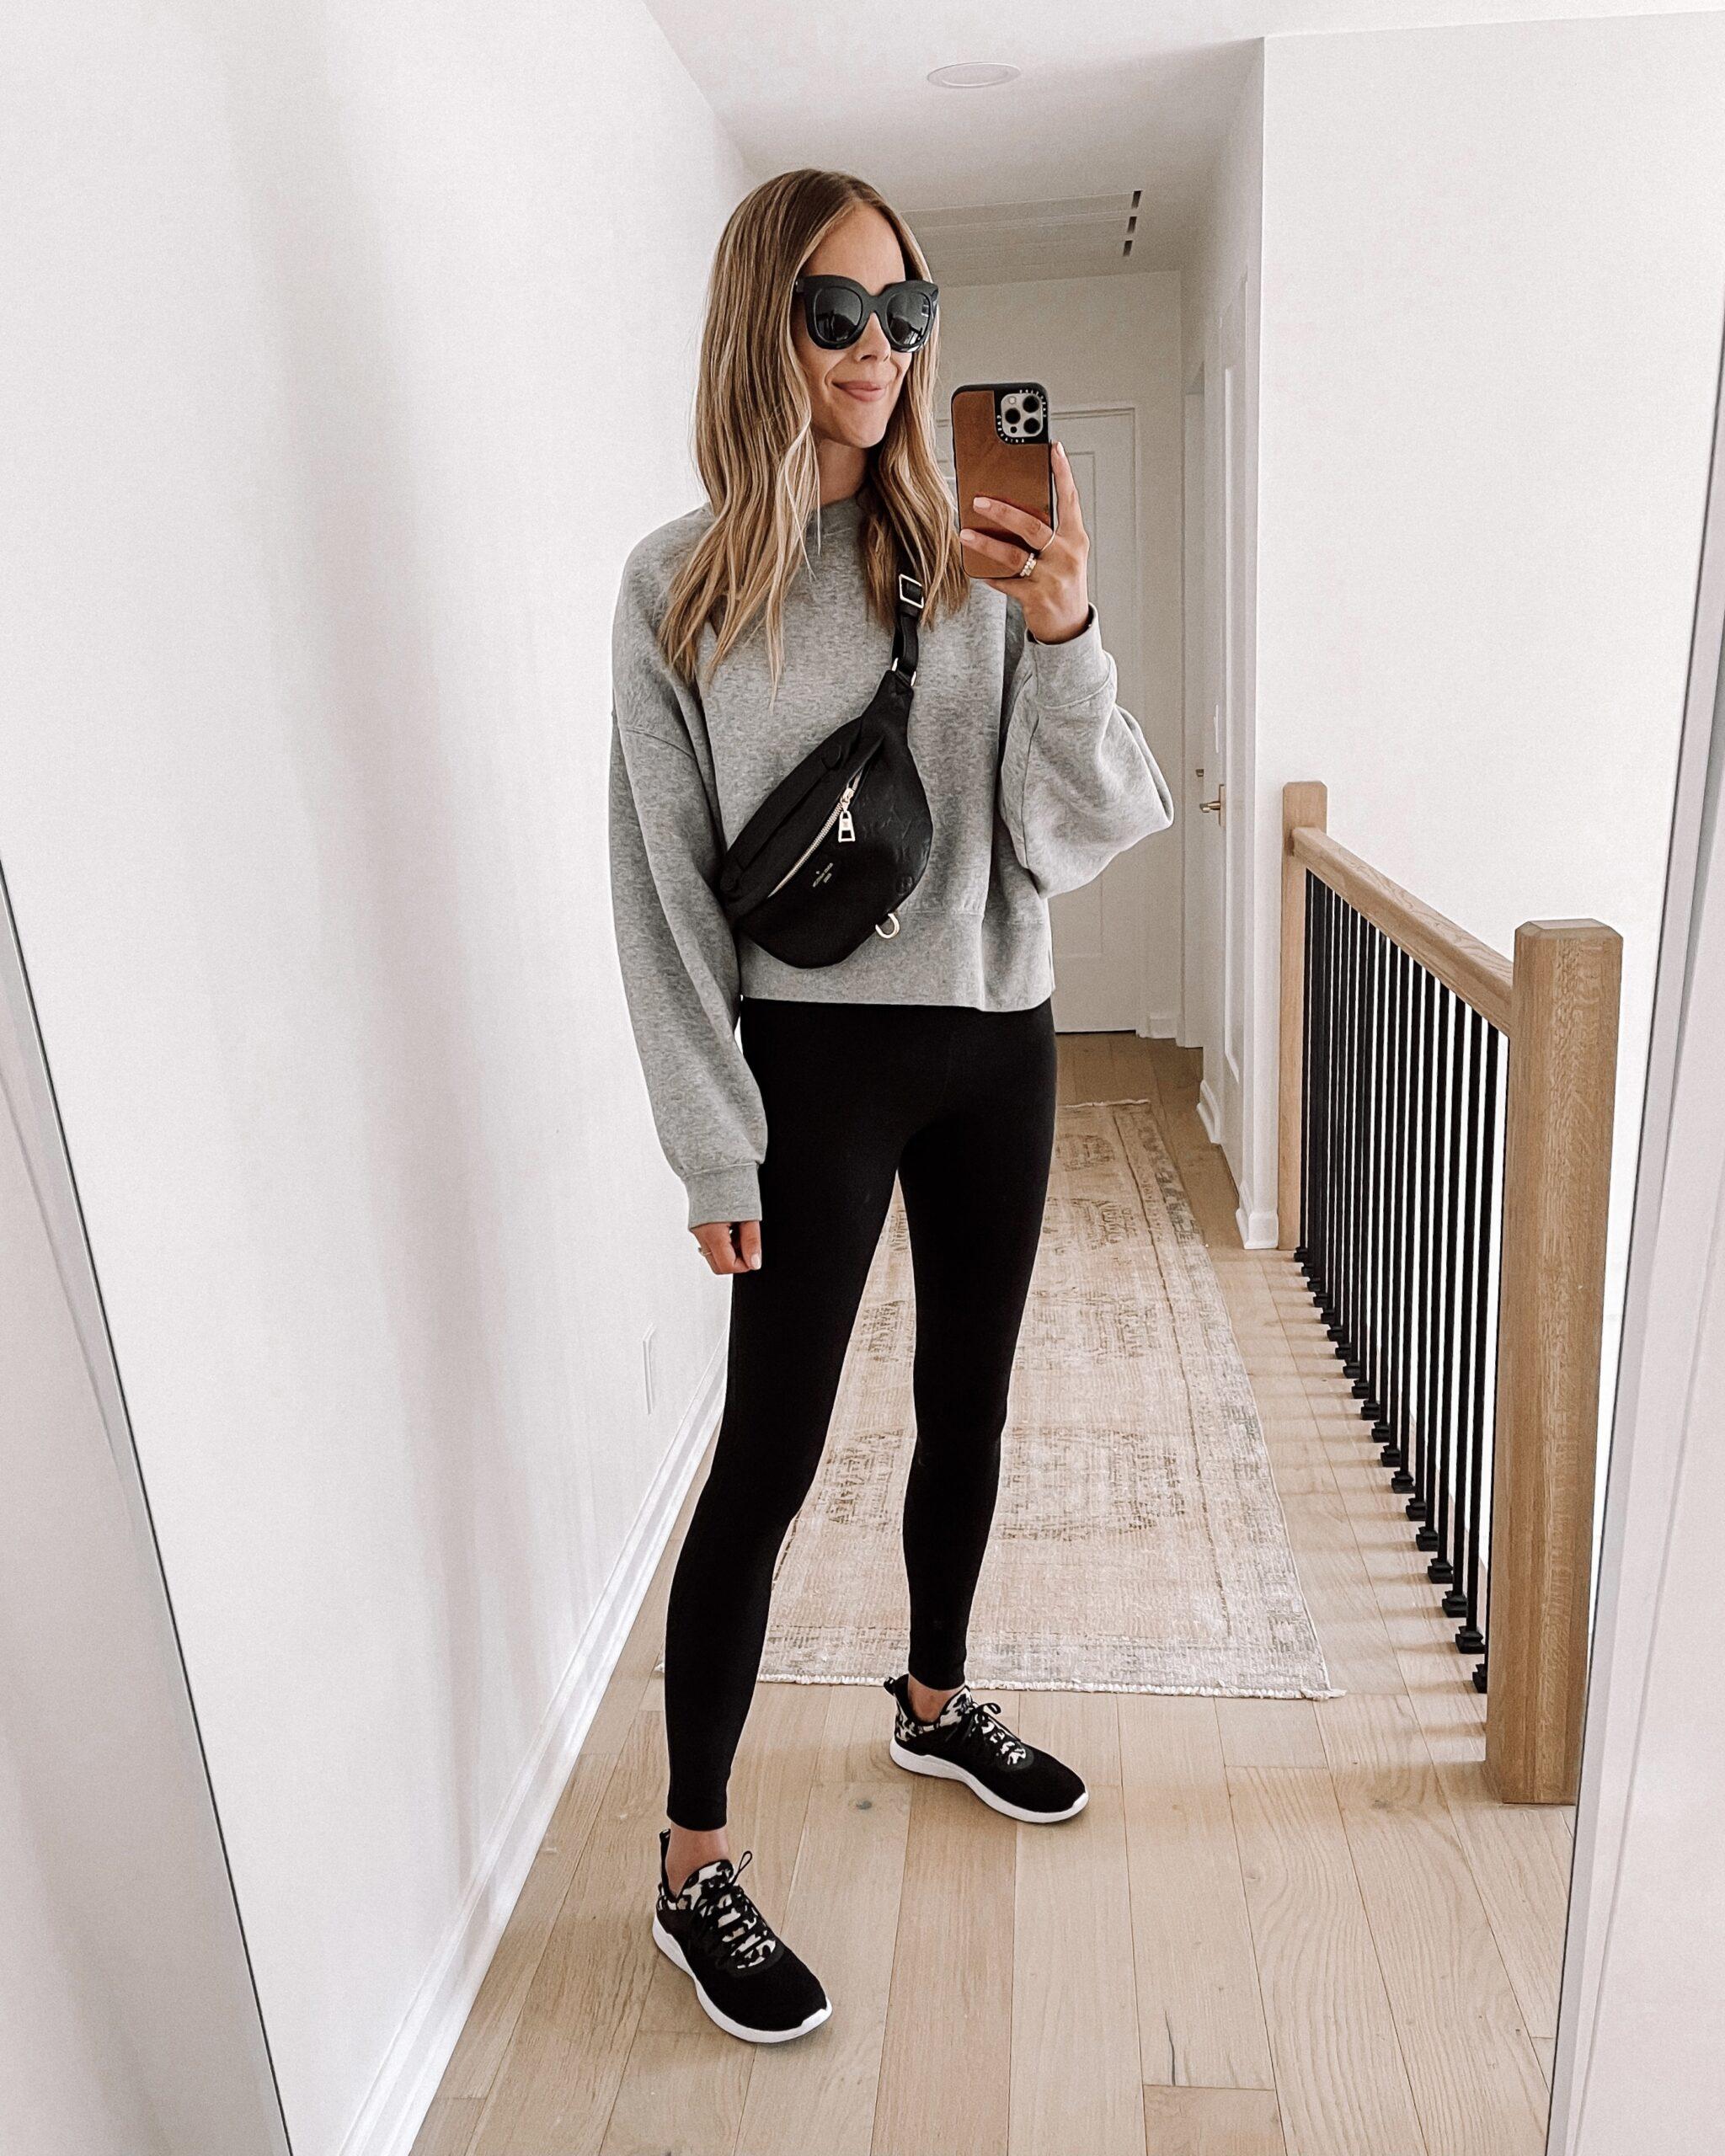 Fashion Jackson Wearing Grey Nike Sweatshirt Black Leggings Black APL Sneakers Black Louis Vuitton Bumbag Womens Fall Shoe Trends